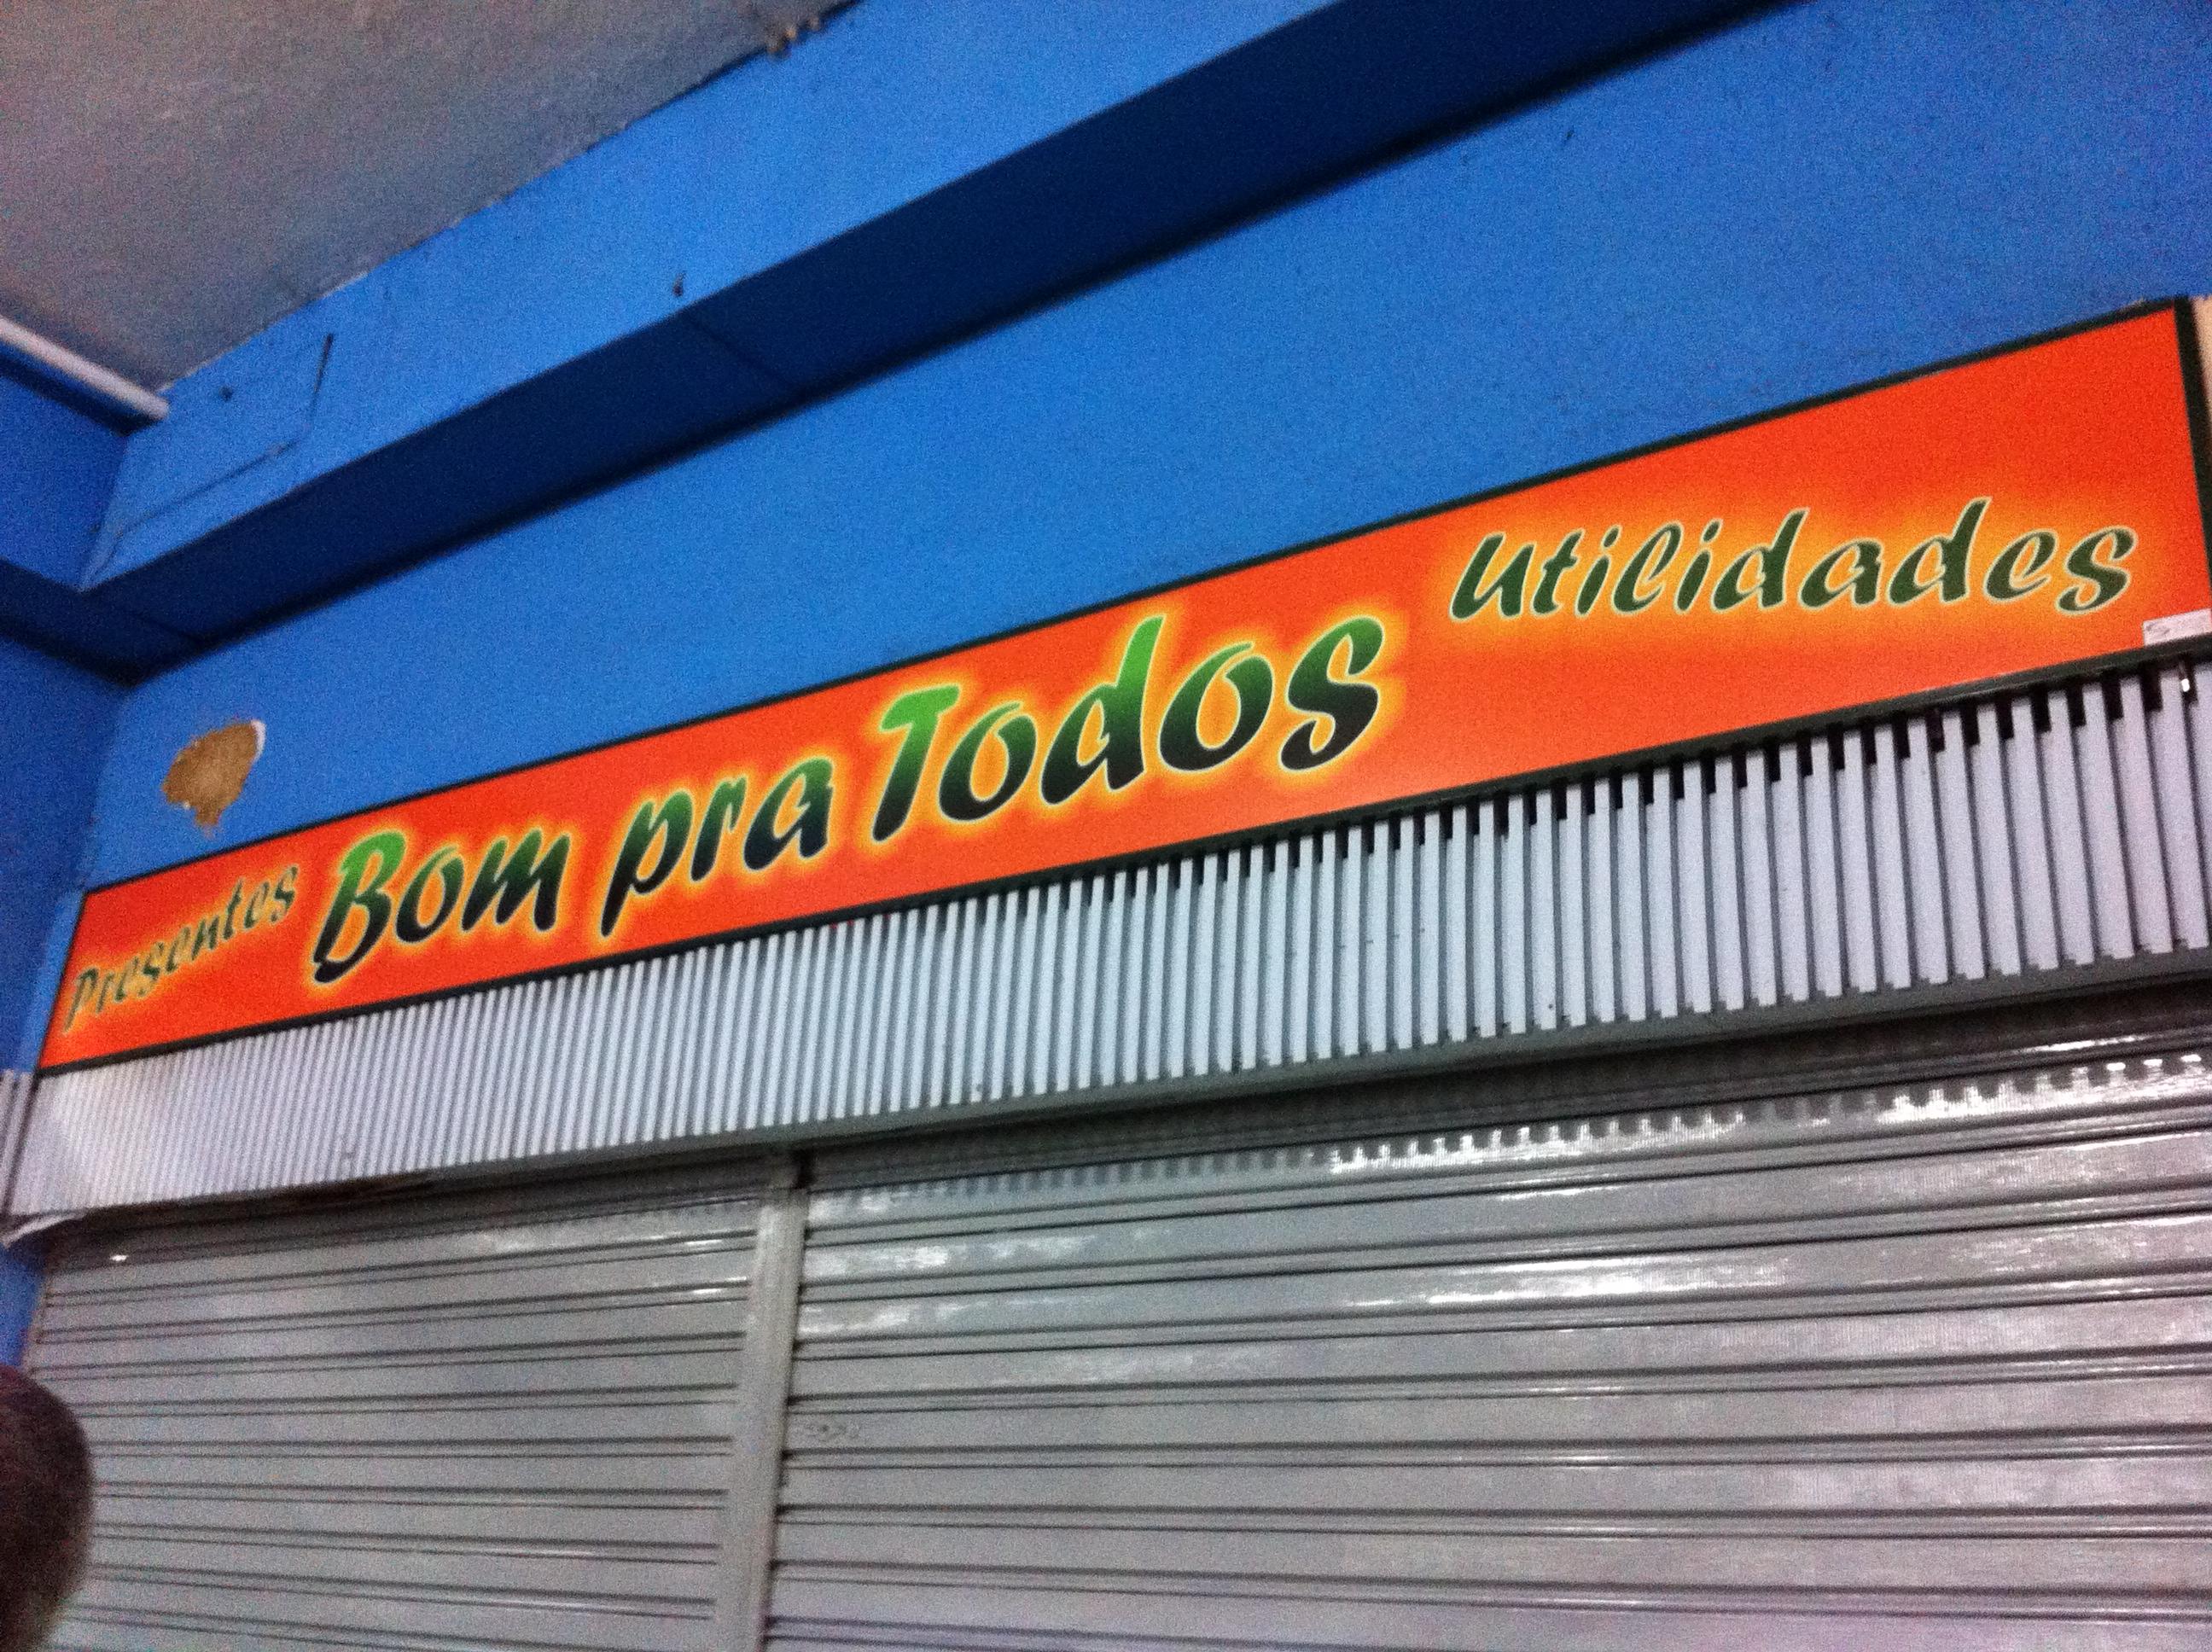 50695 Bom pra Todos (2).jpeg